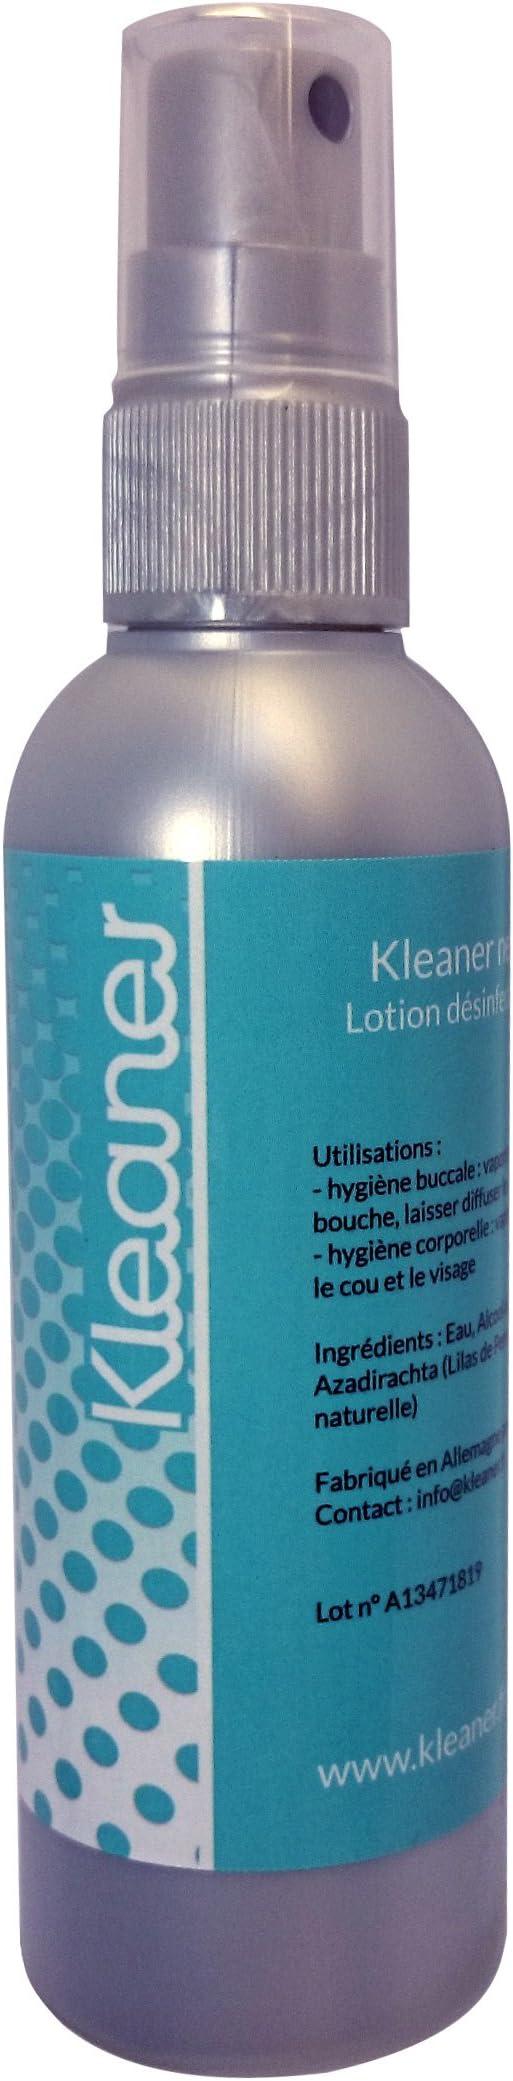 Limpiador de Toxinas salivares / de saliva Kleaner (100ml): Amazon ...